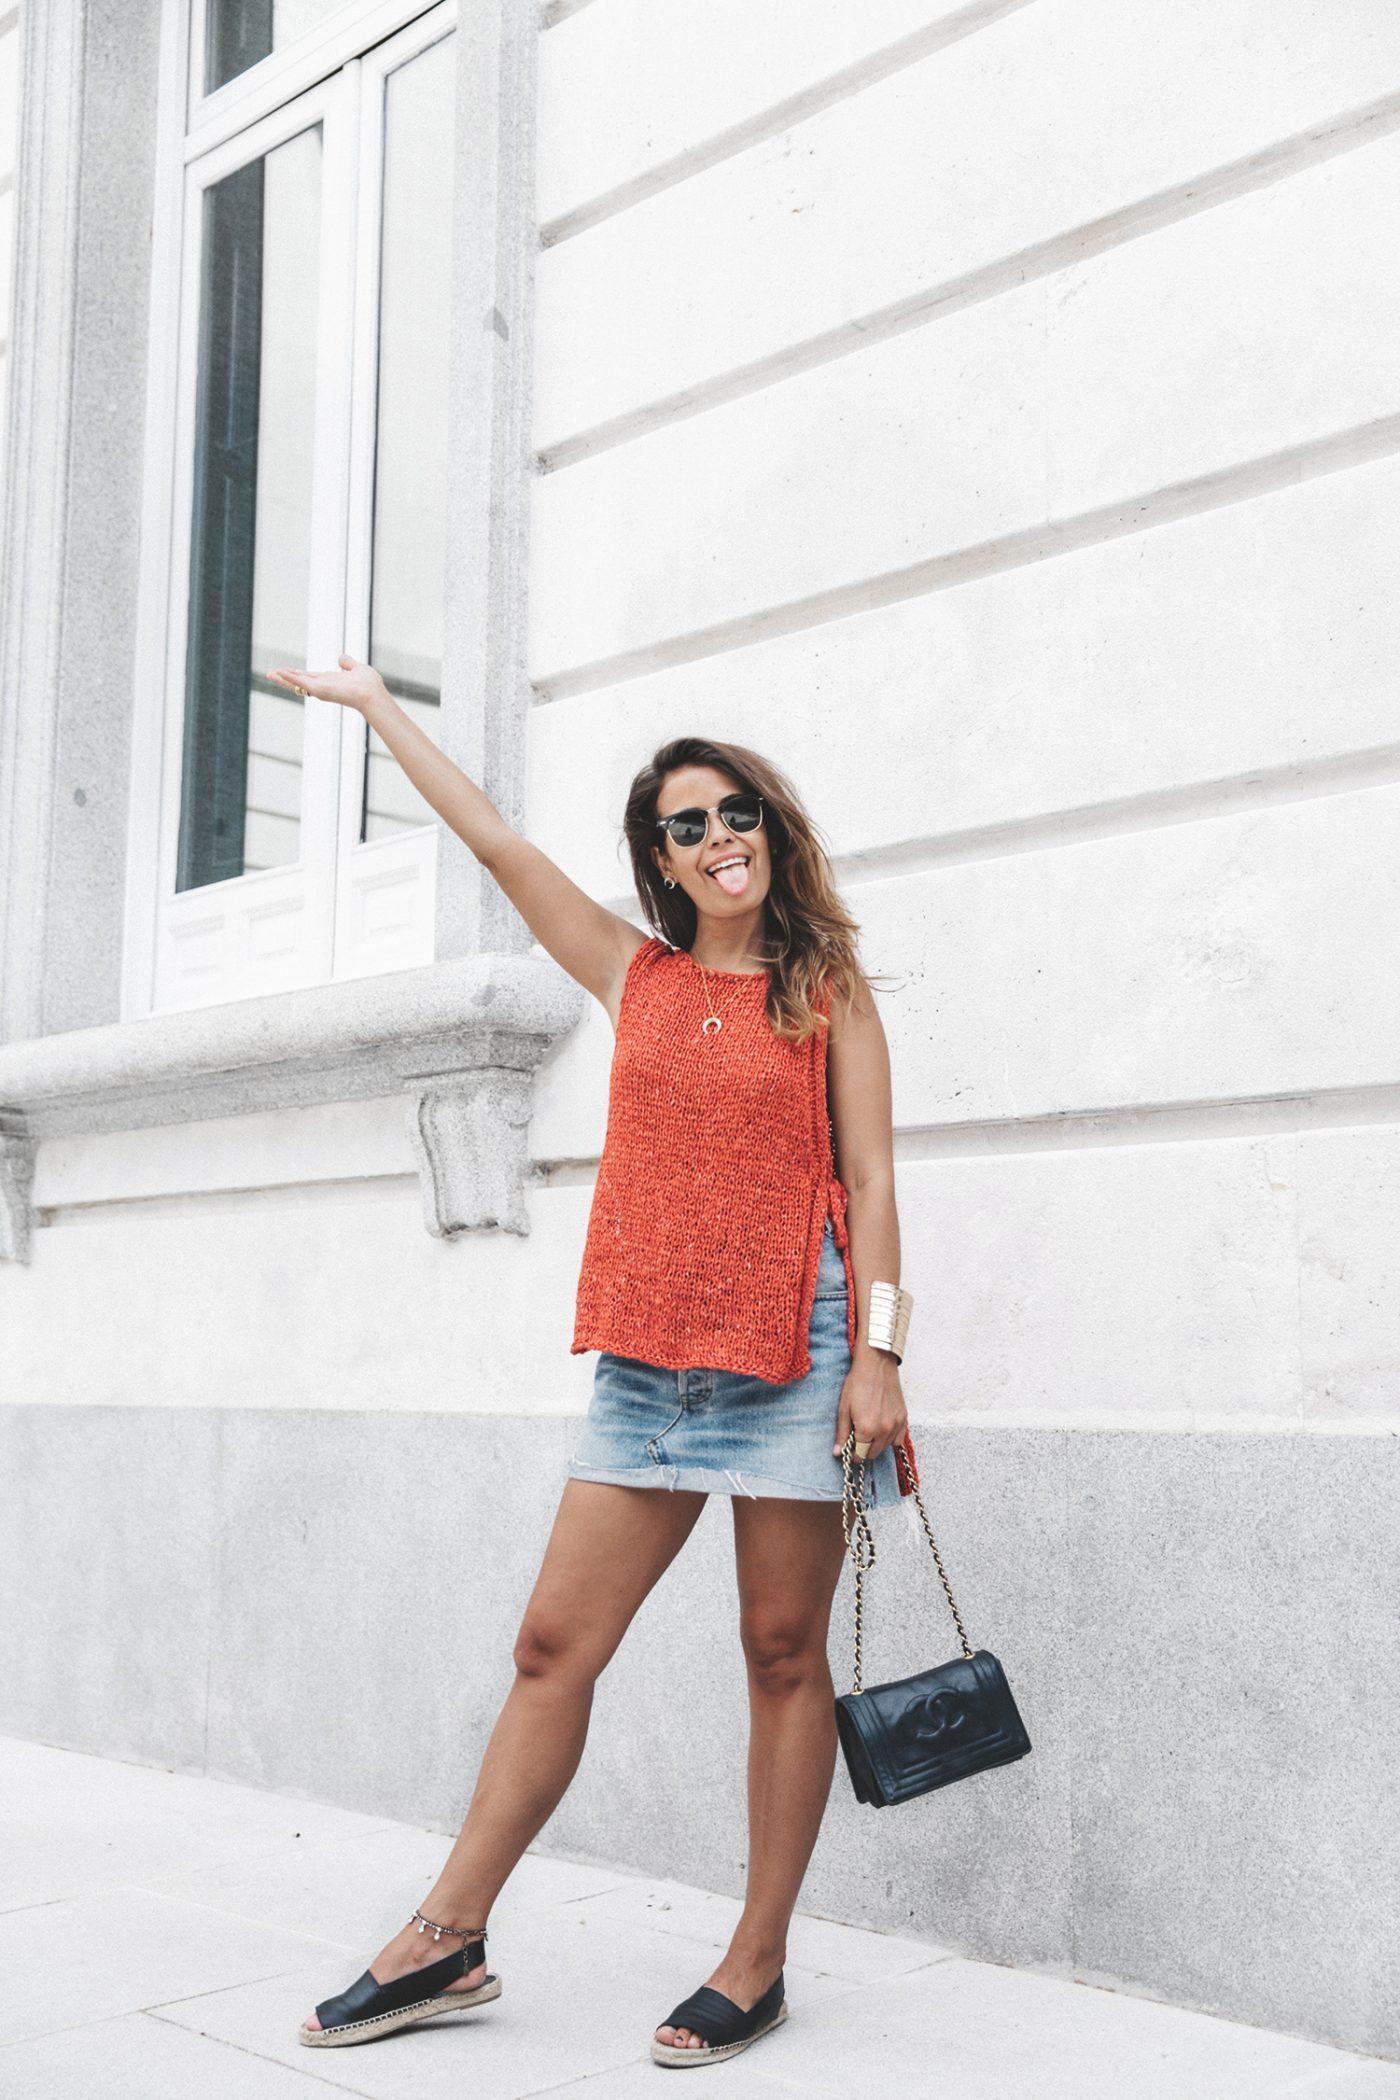 Summery_knit-Levis_Vintage_Skirt-Zalando_Espadrilles-Black_Sandals-Collage_Vintage_Horn_Necklace-Outfit-Street_Style-32